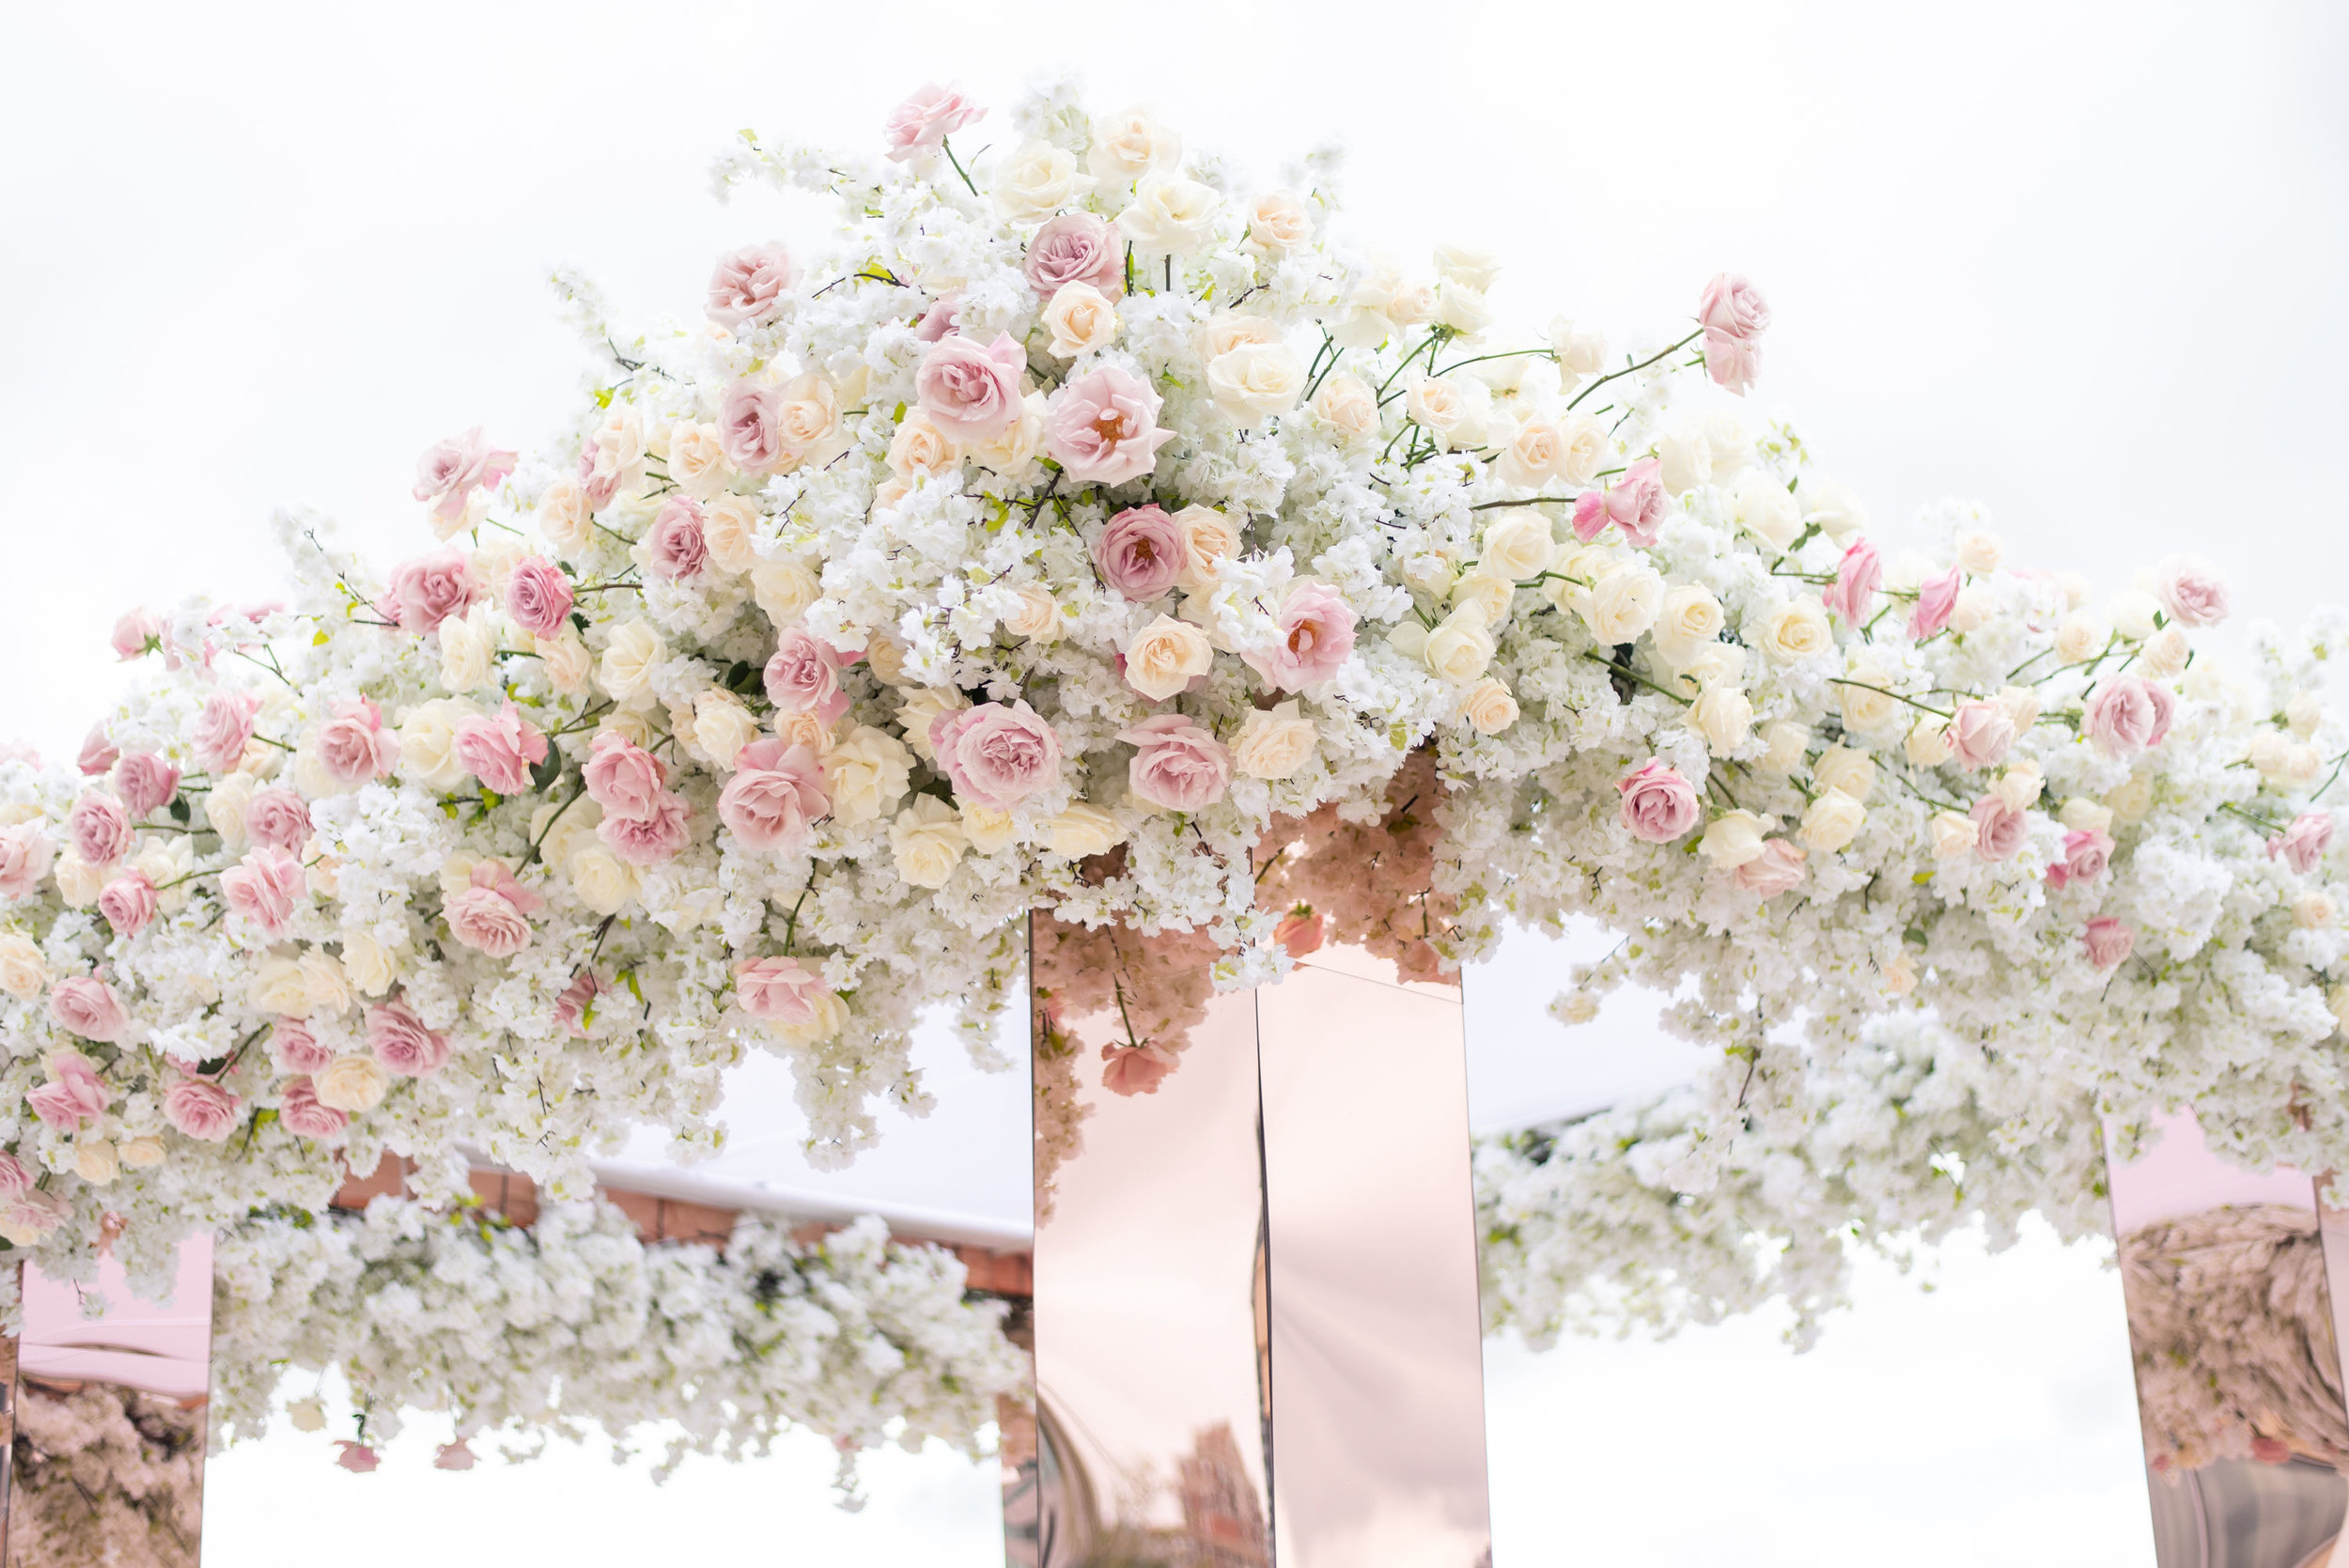 INDIAN WEDDING ALTER FLOWERS 2.jpg